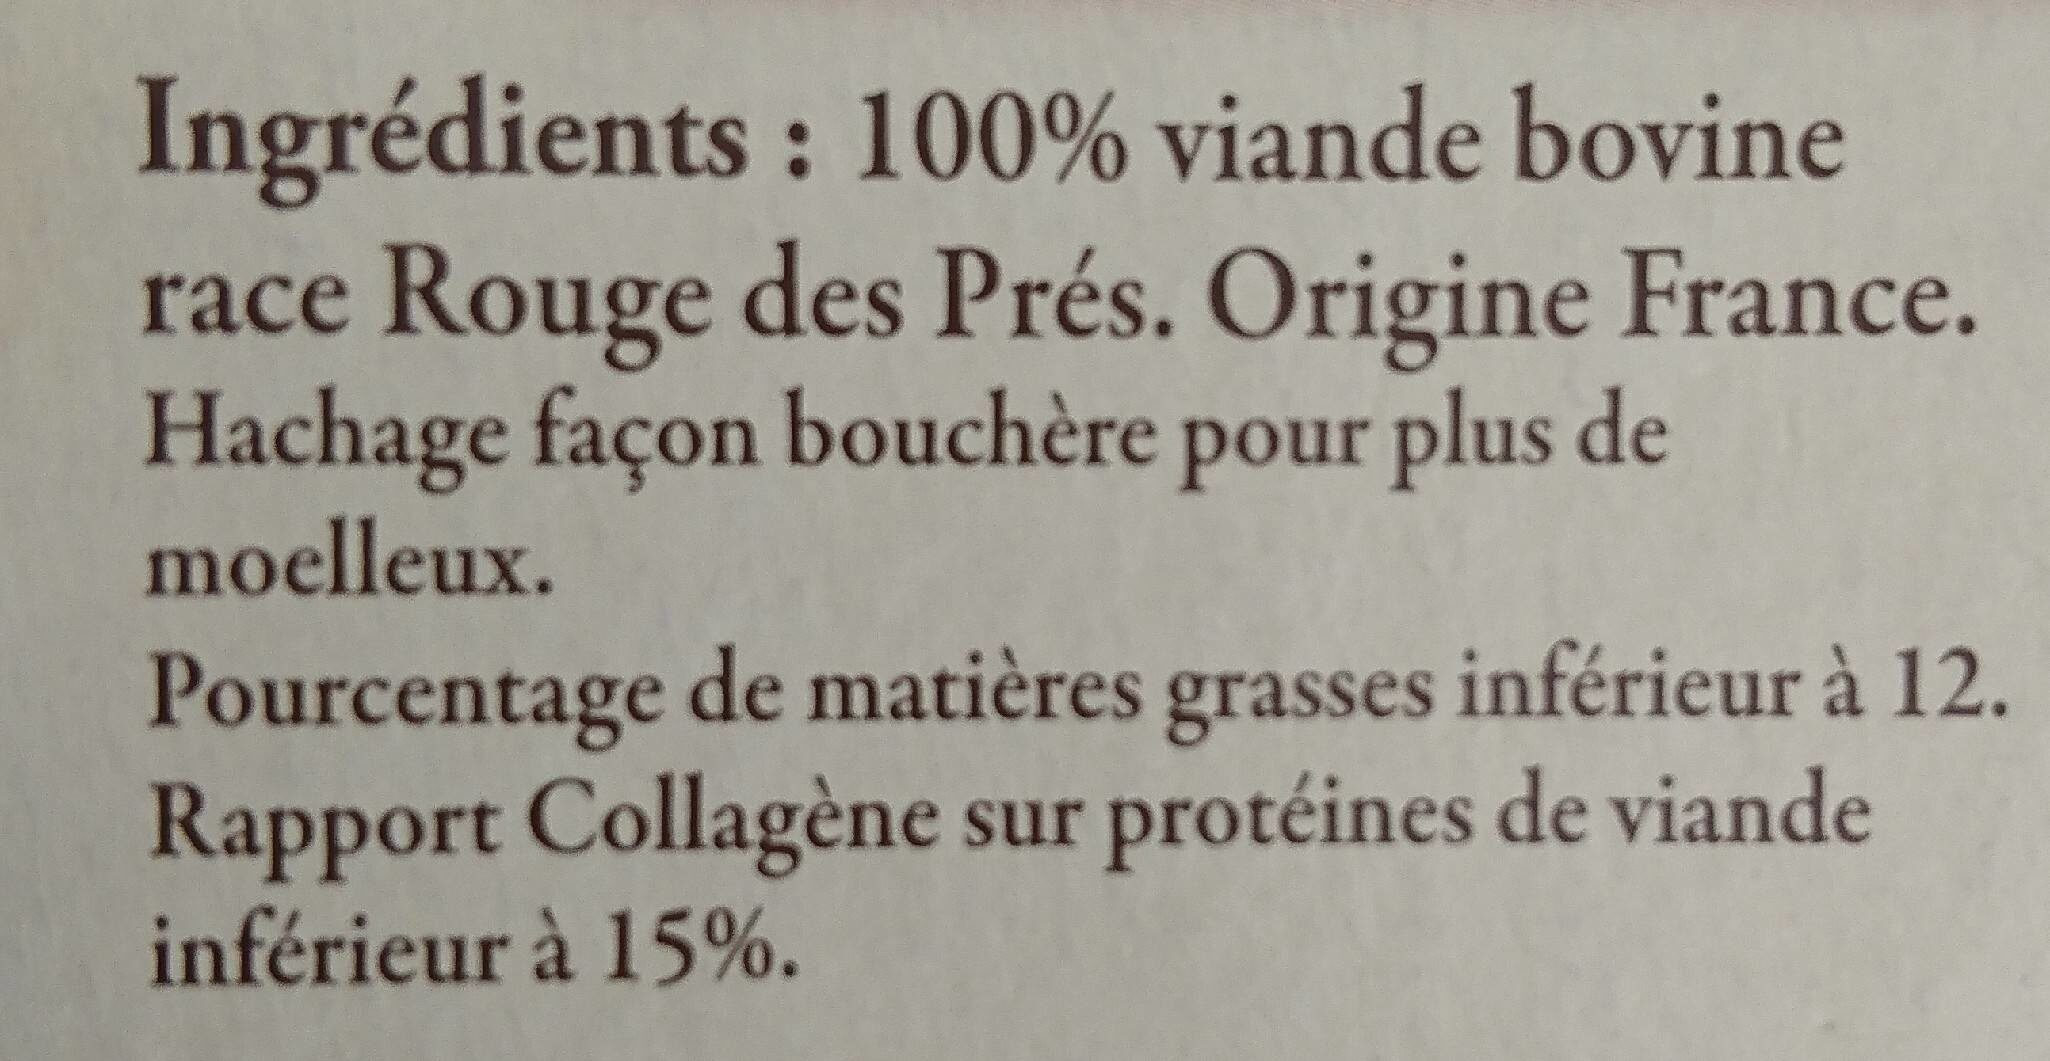 2 steak hachés race Rouge de Près - Voedingswaarden